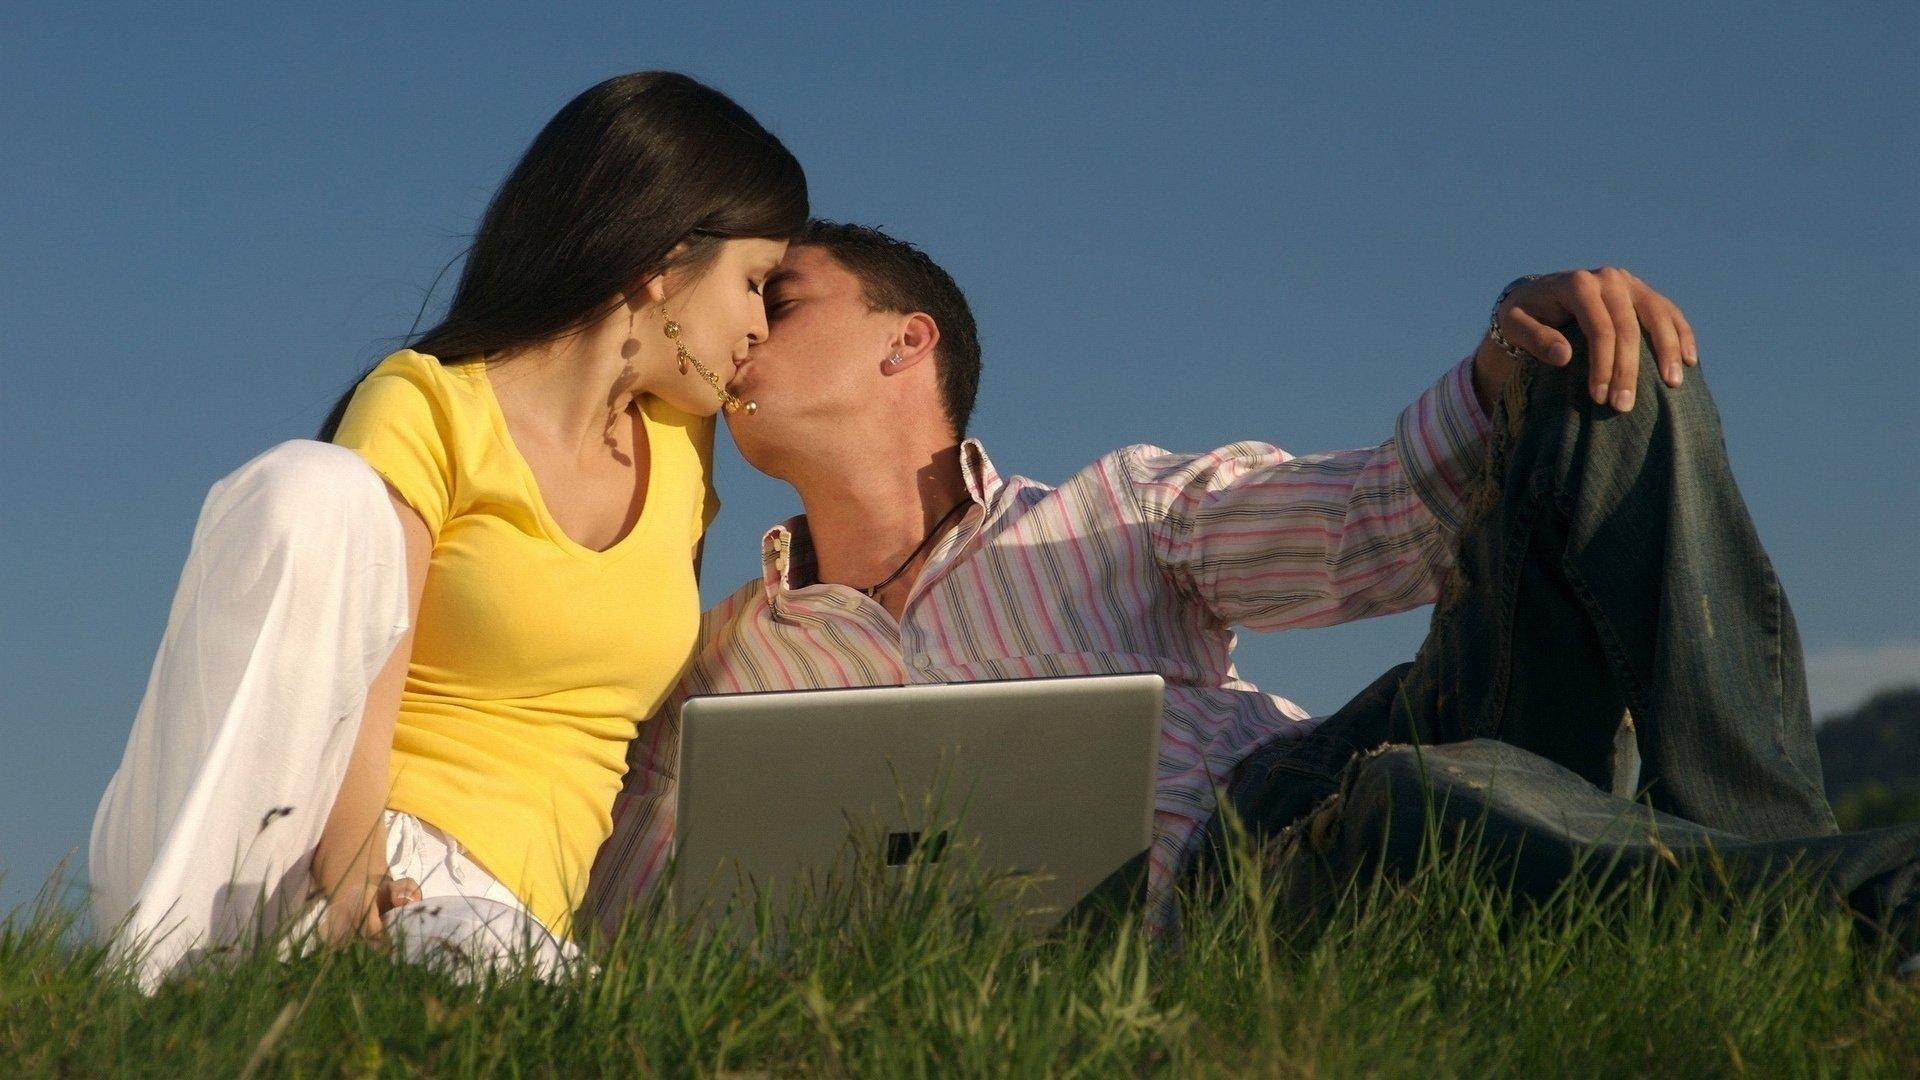 Romantic Love Wallpaper Free Download